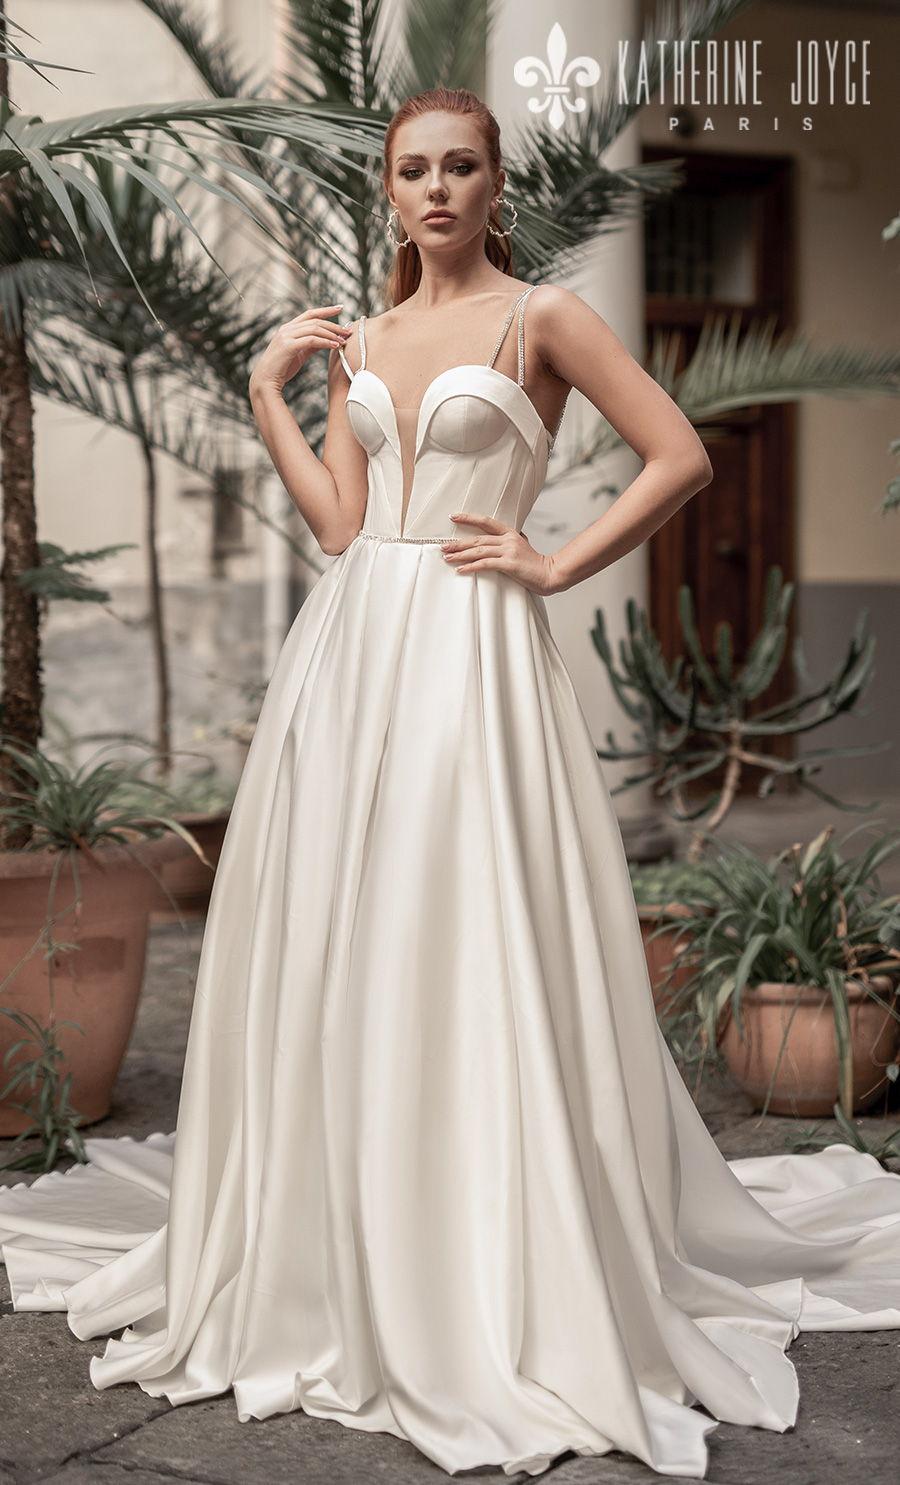 katherine joyce 2021 naples bridal double strap deep plunging sweetheart neckline minimalist simple modern a line wedding dress mid back royal train (muza) mv